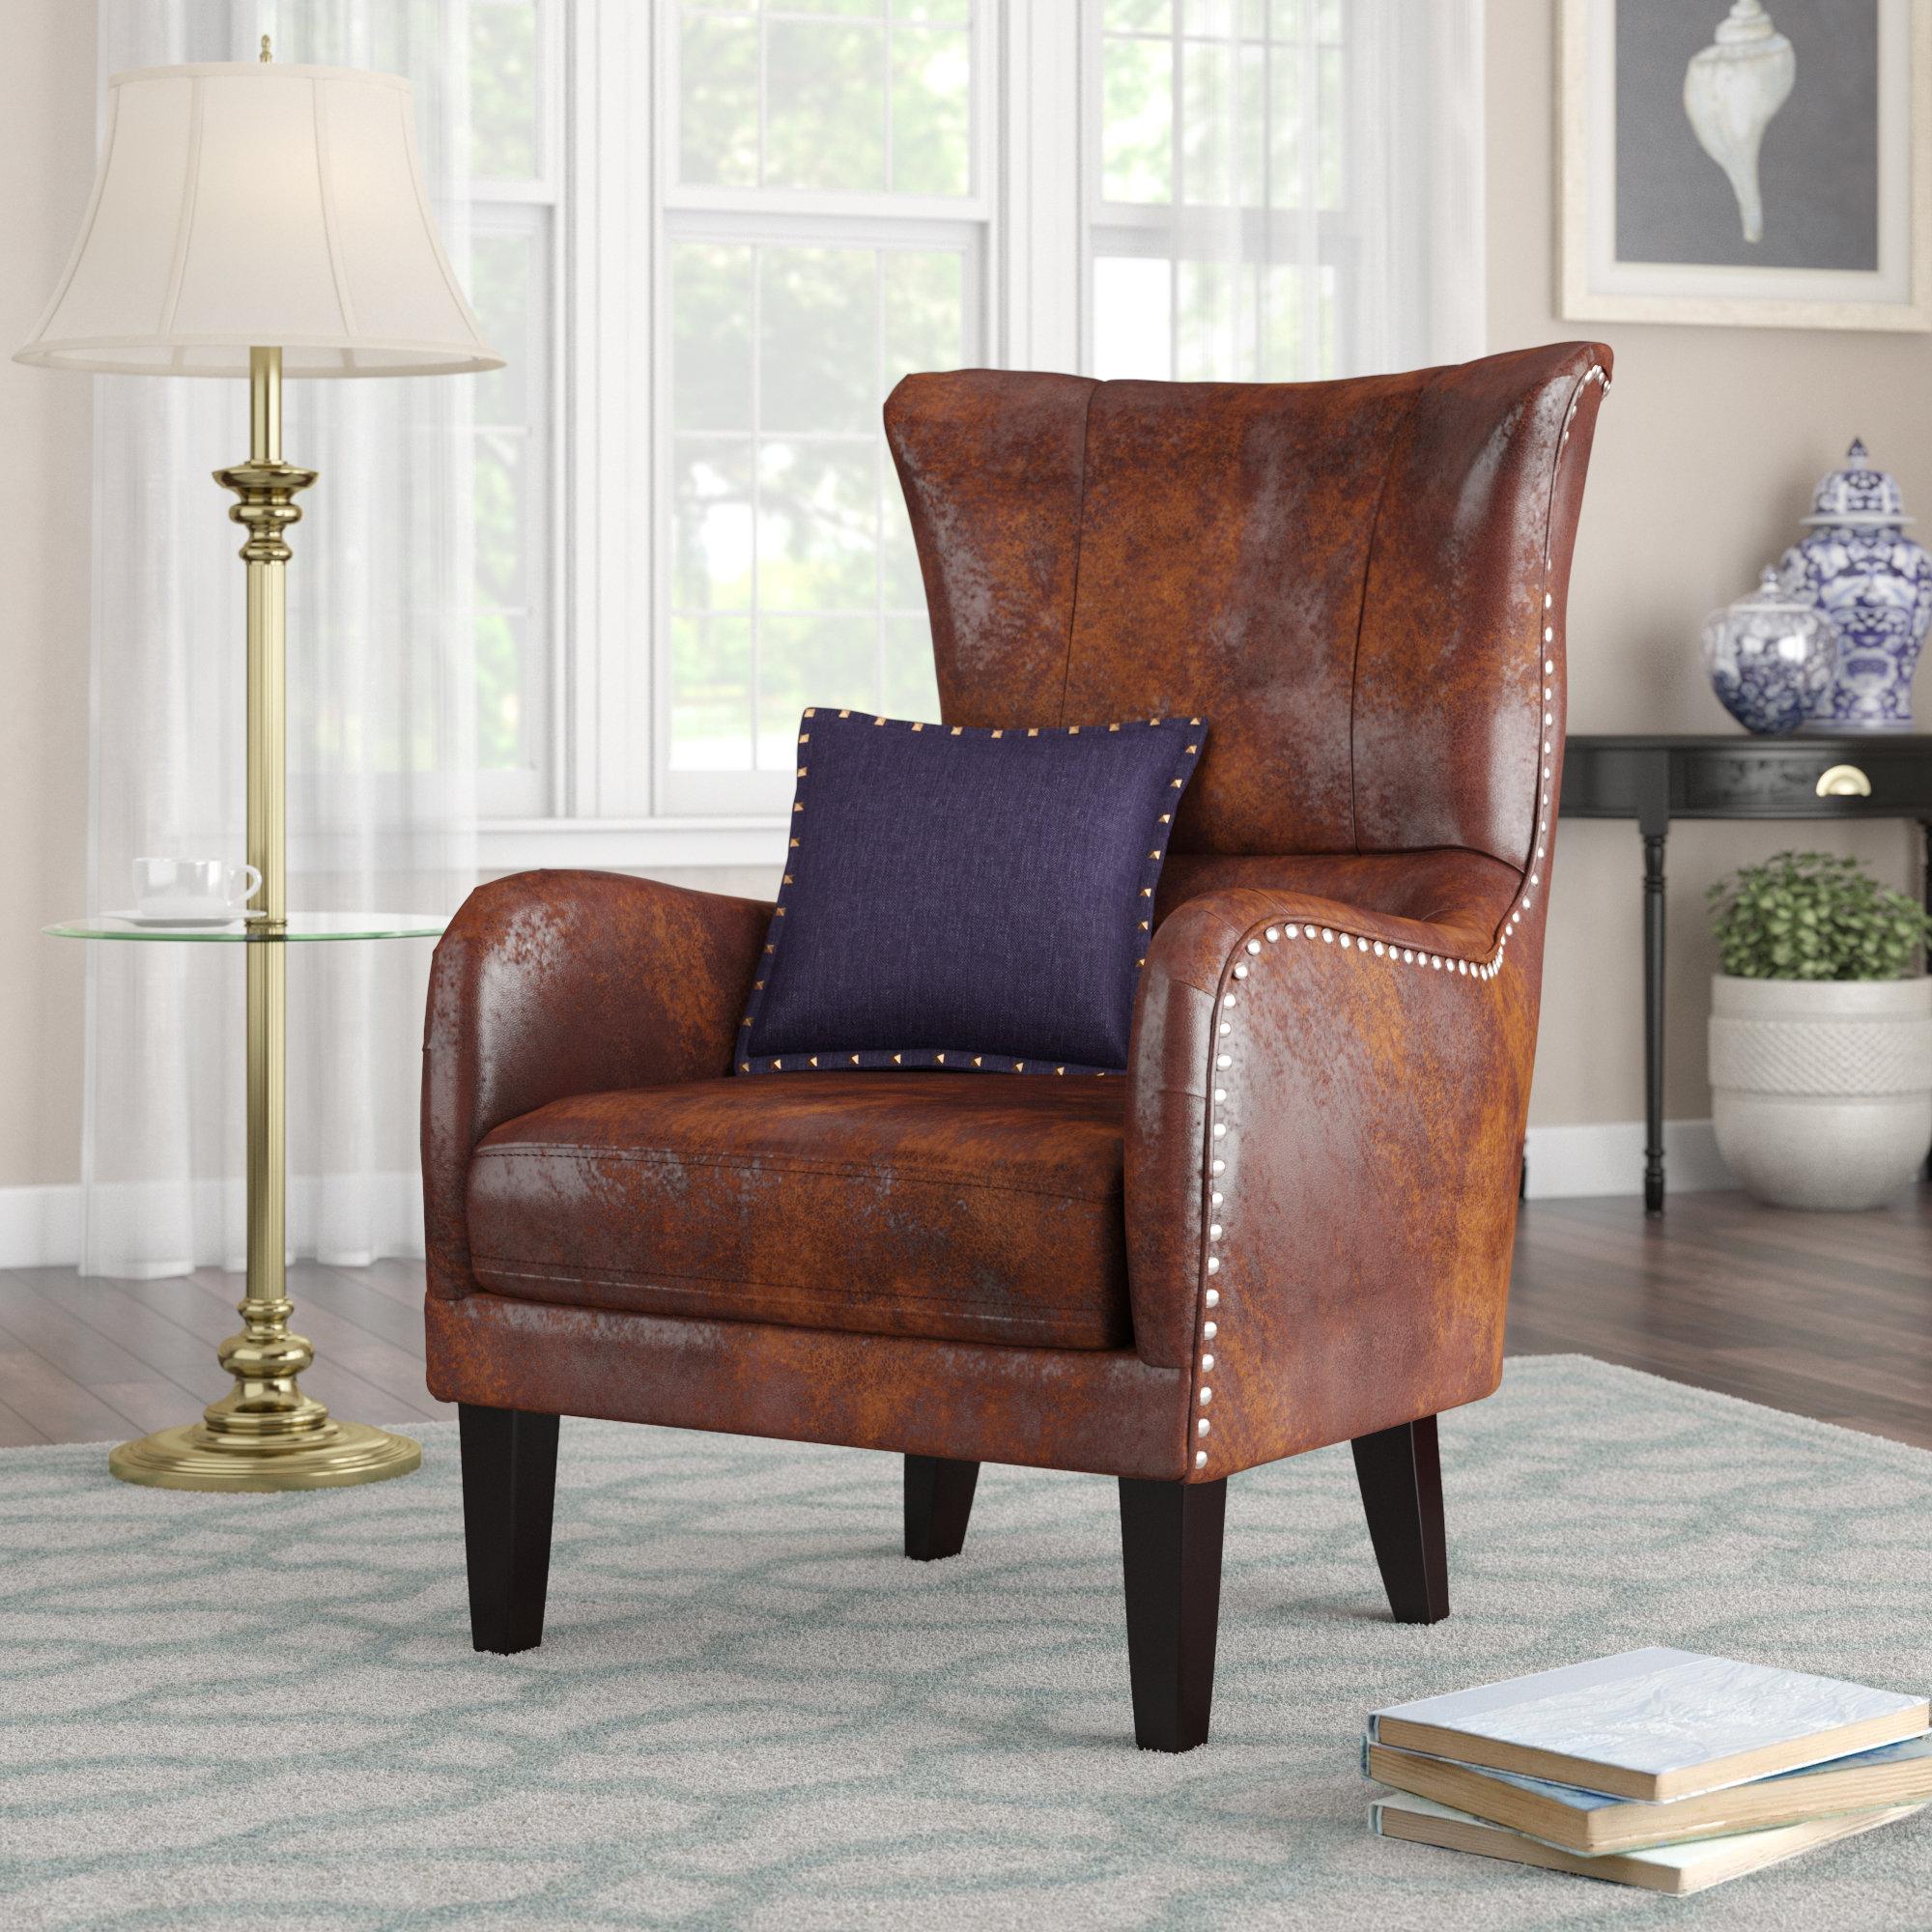 Alcott Hill Gordon Wingback Chair & Reviews | Wayfair With Regard To Gordon Arm Sofa Chairs (View 22 of 25)